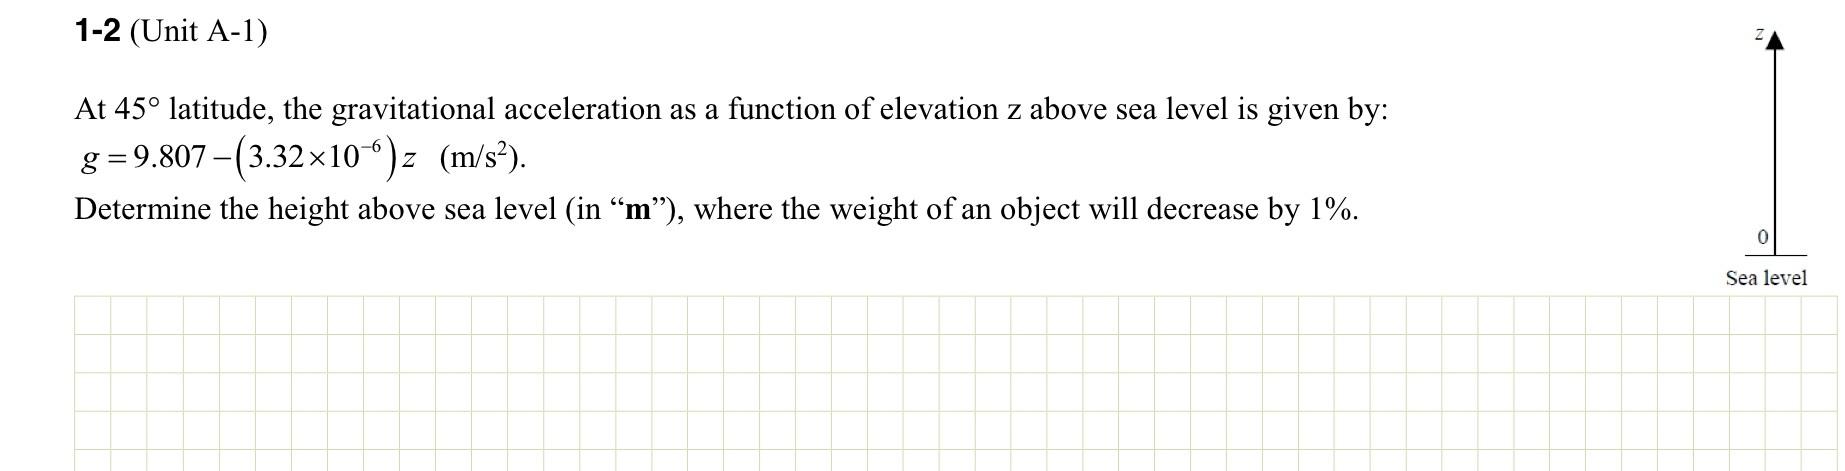 Unit A At Degree Latitude The Gravitat Cheggcom - How to determine sea level elevation